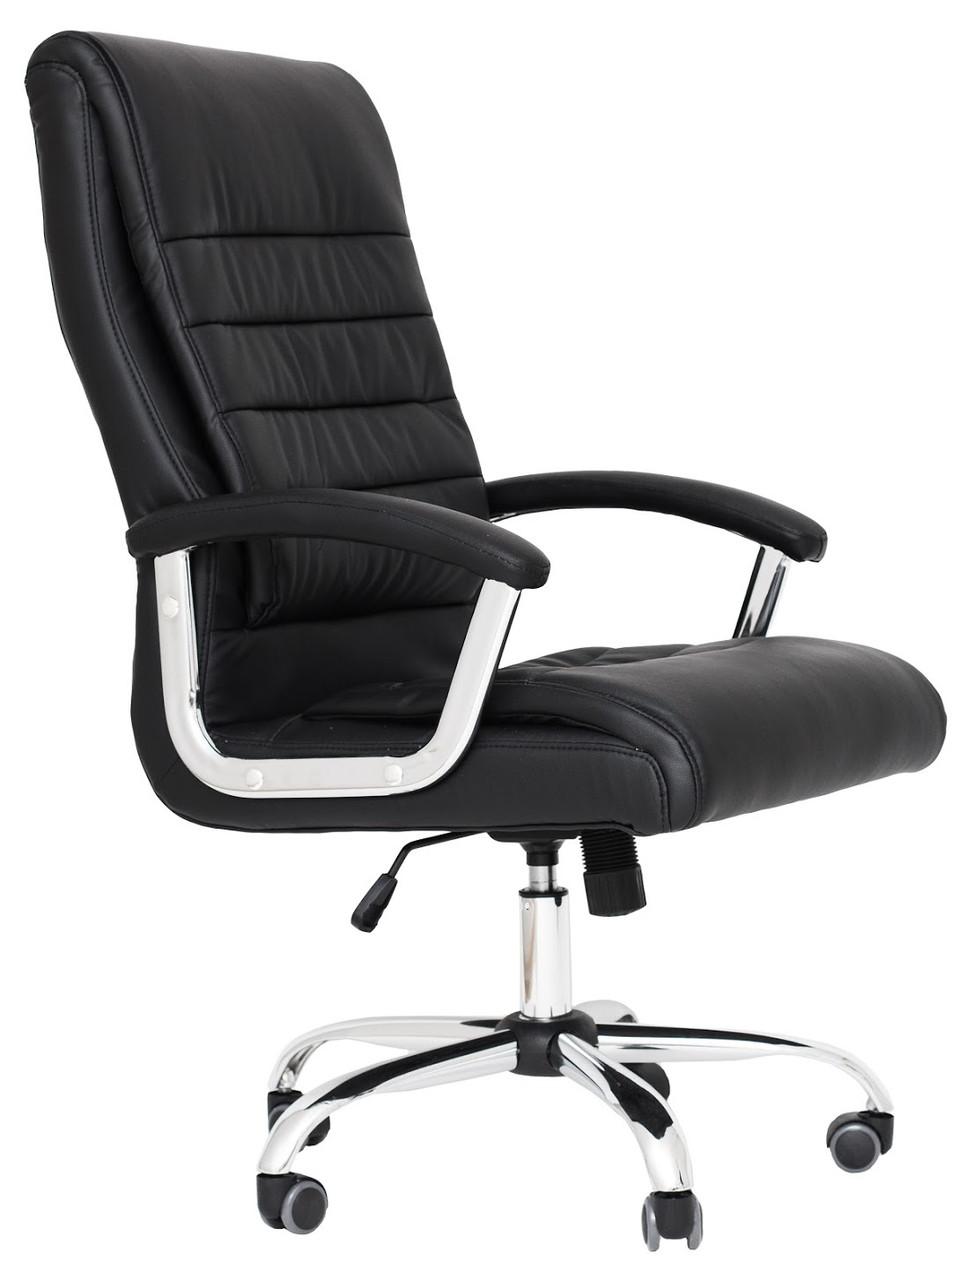 Офисное кресло ПРИНСТОН Ю (Prinstone U), ТМ Richman